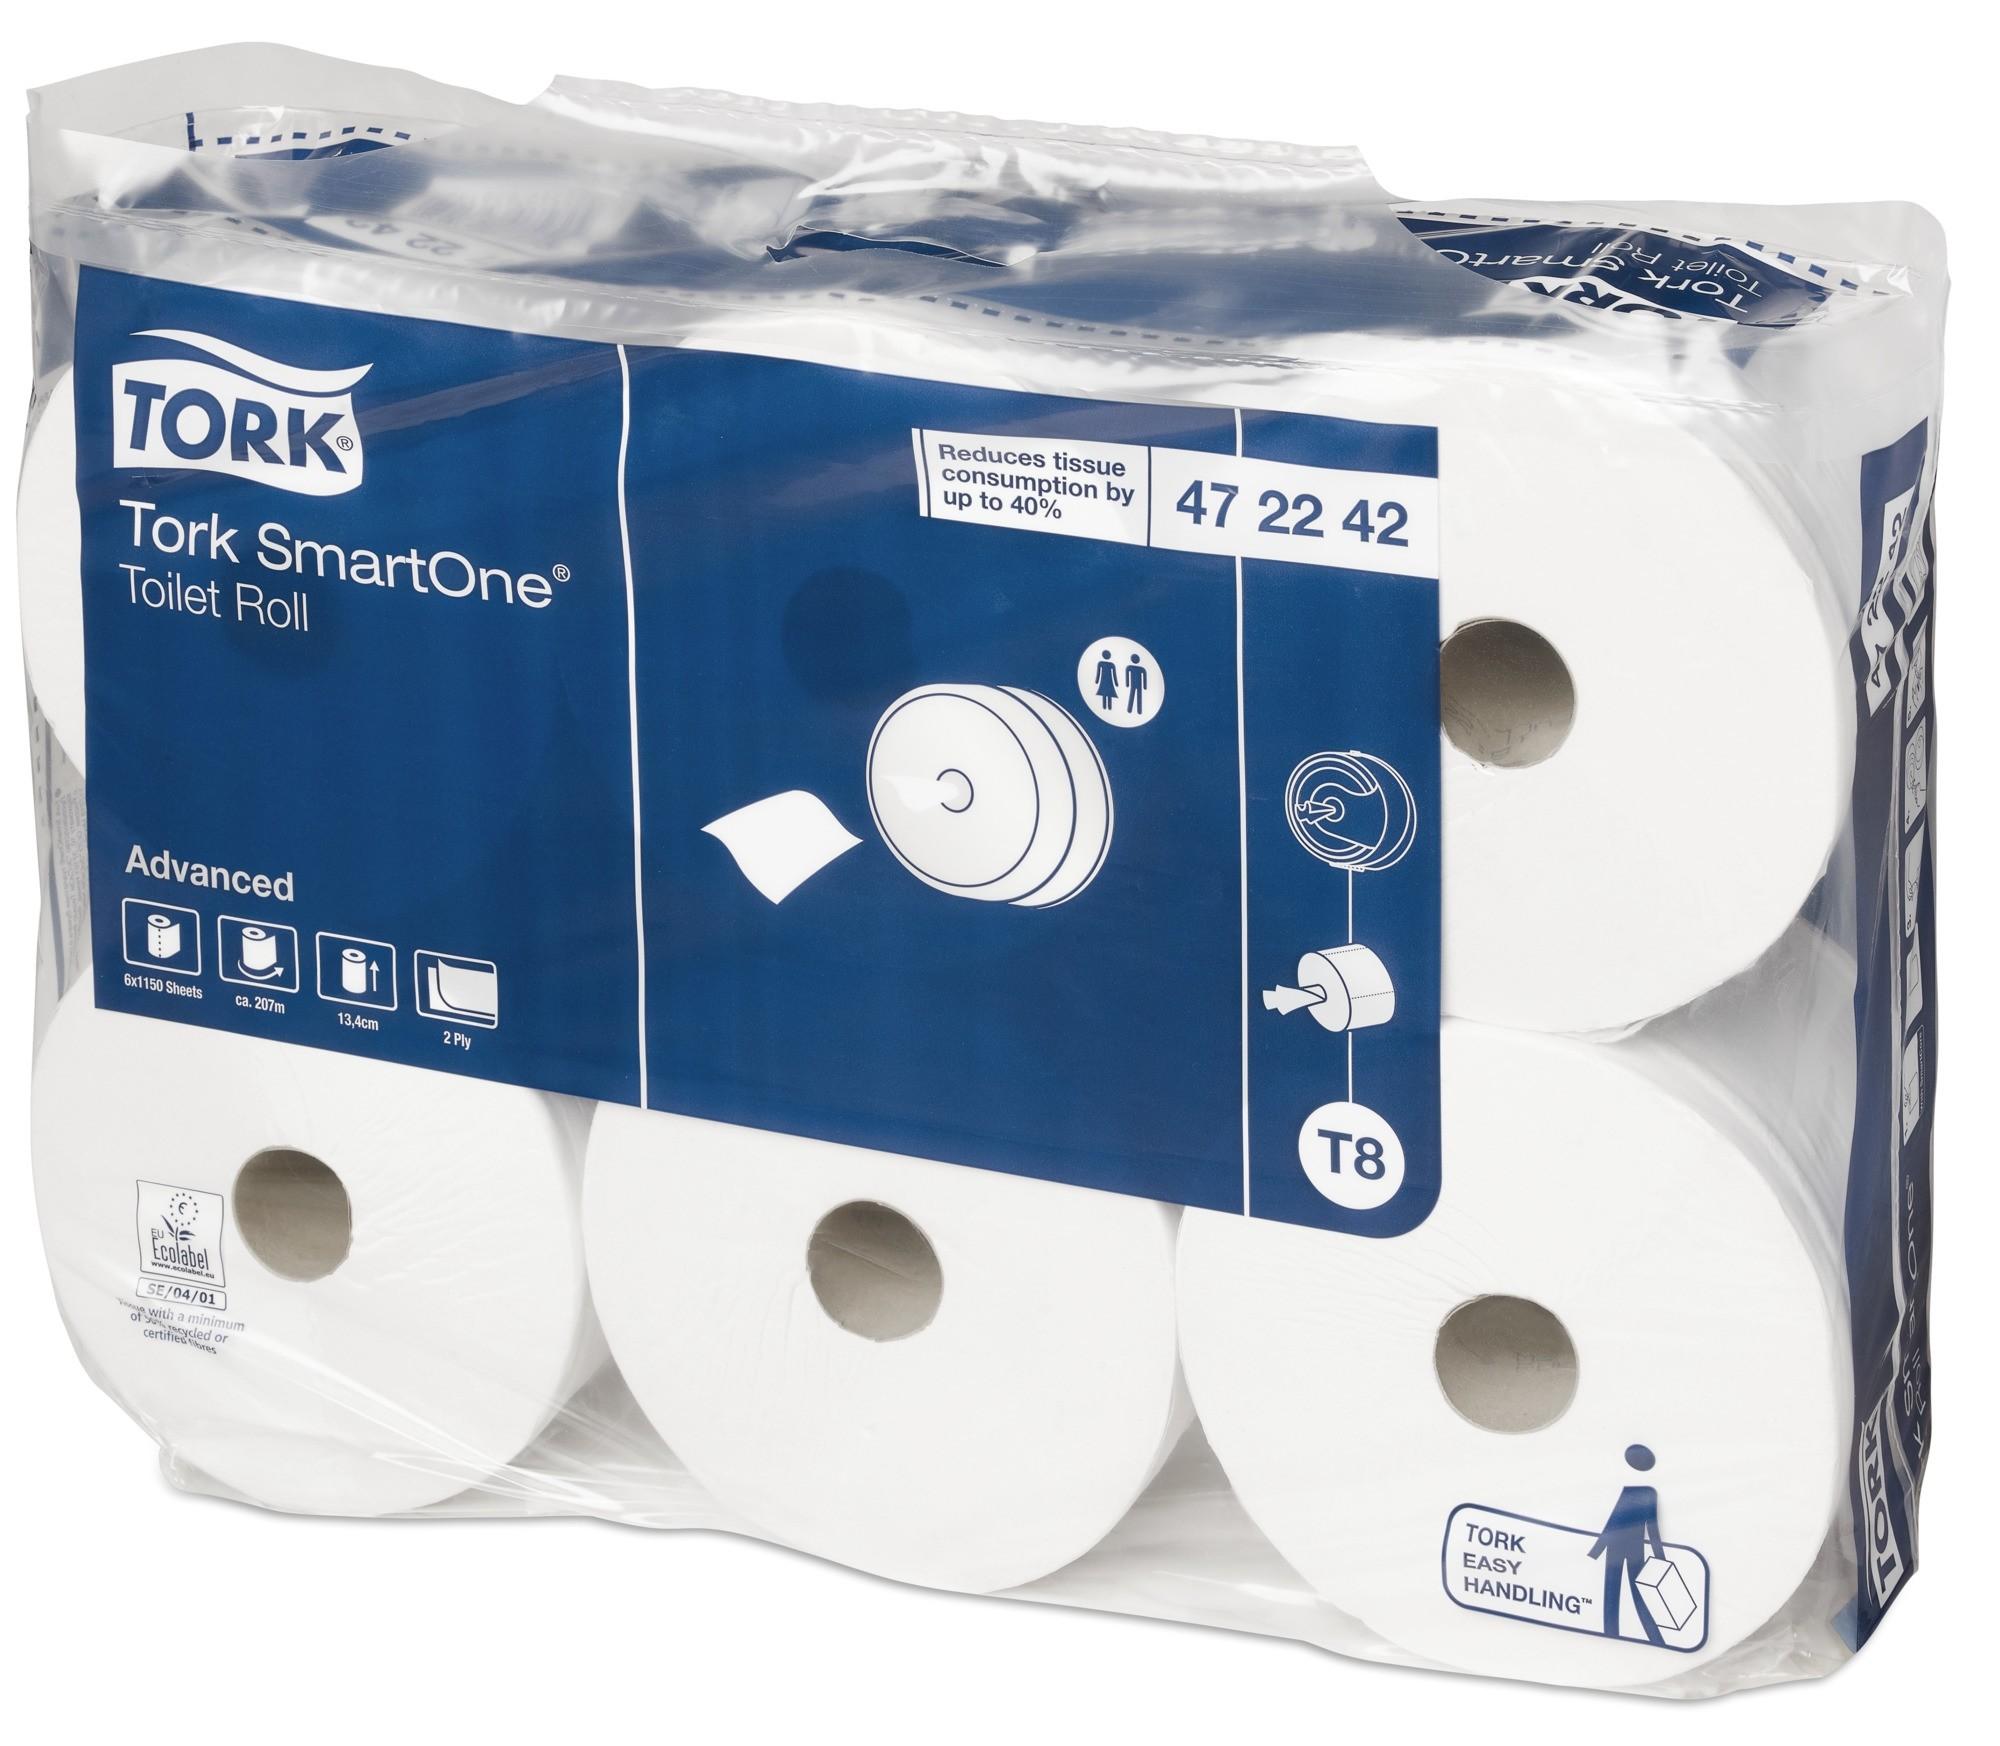 Tork SmartOne Toilet Roll 2ply